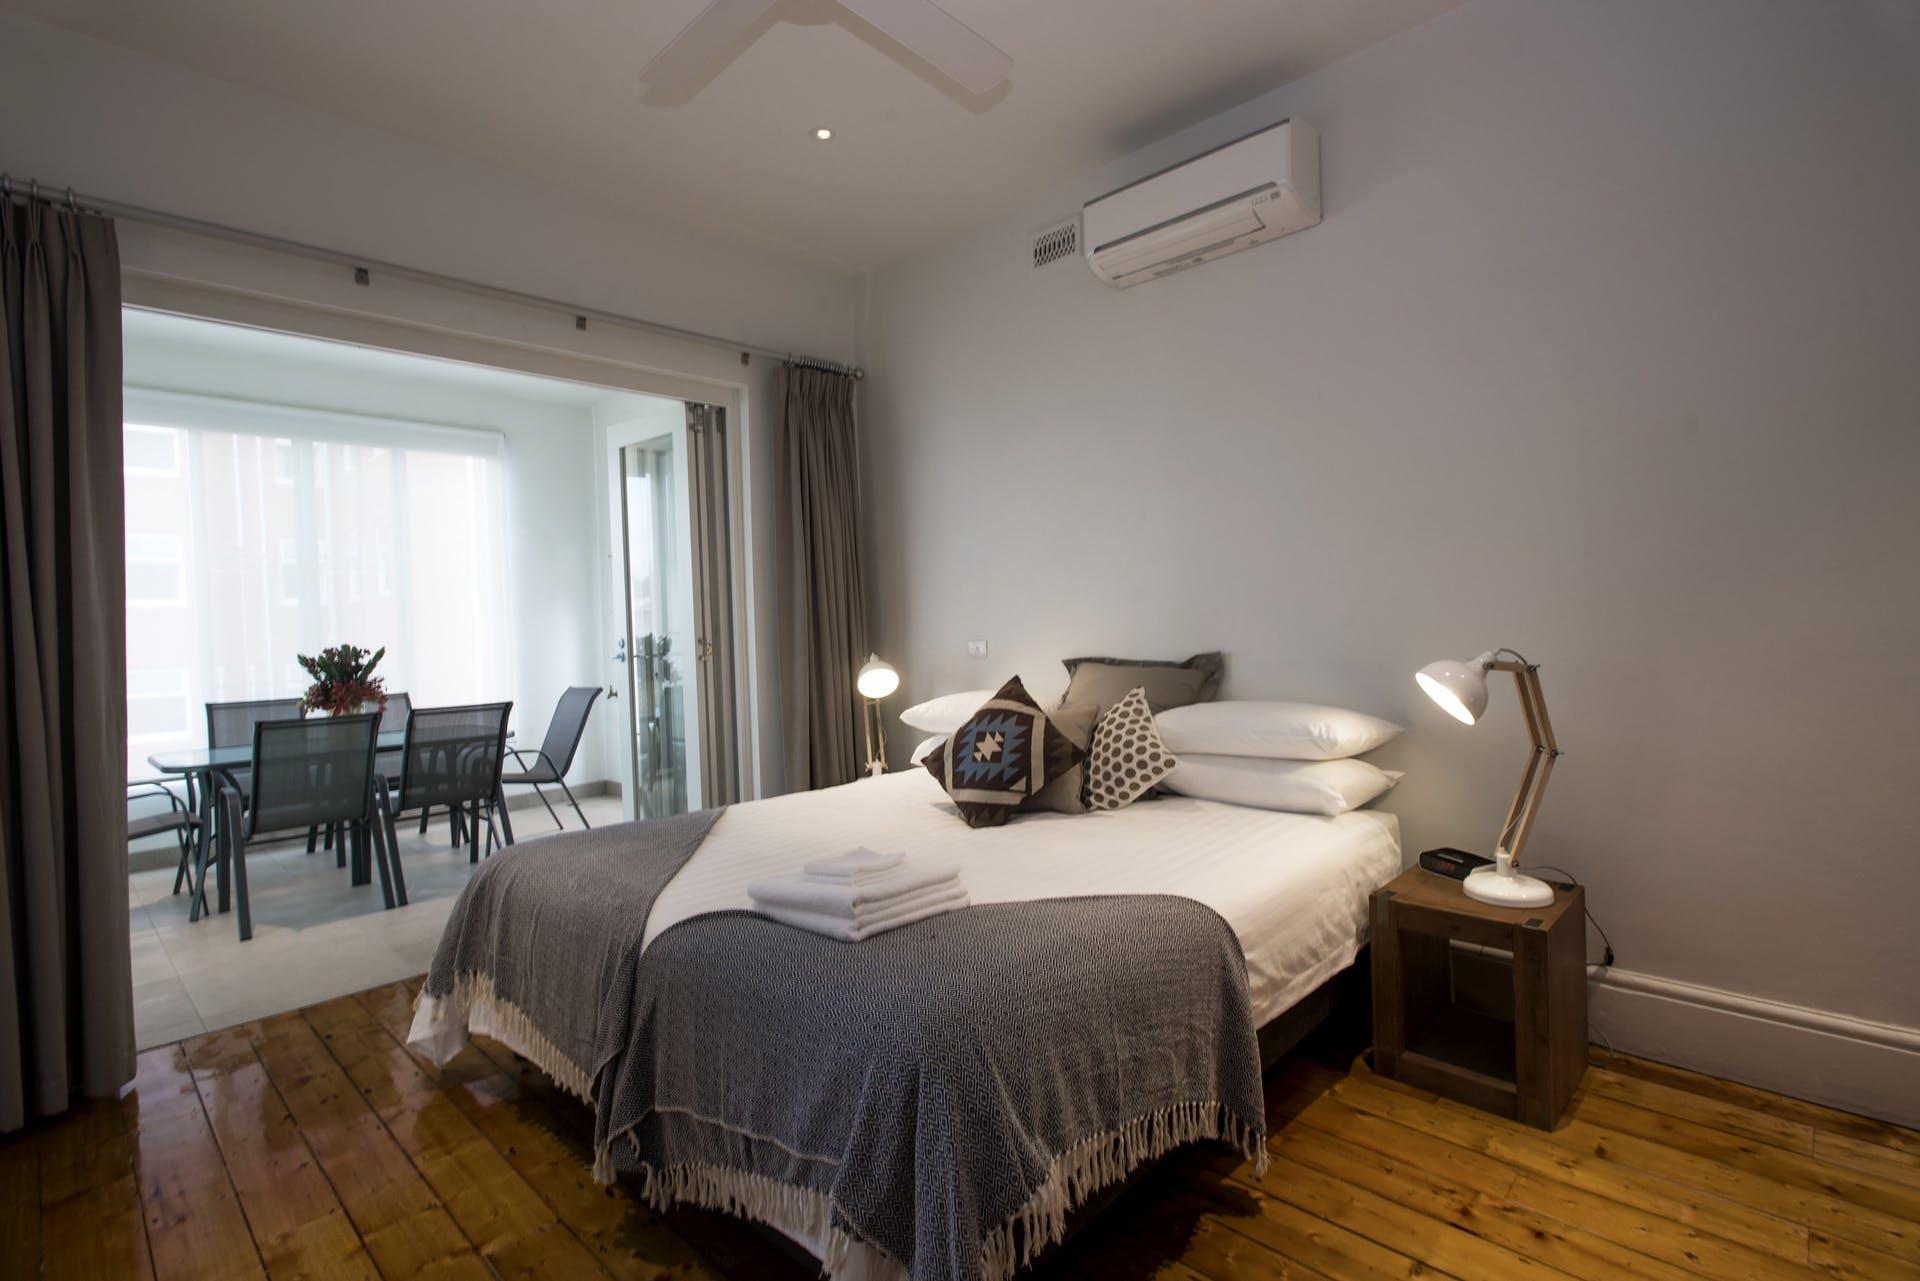 601-king-street-west-melbourne-student-accommodation-Melbourne-Bedroom-2-Unilodgers